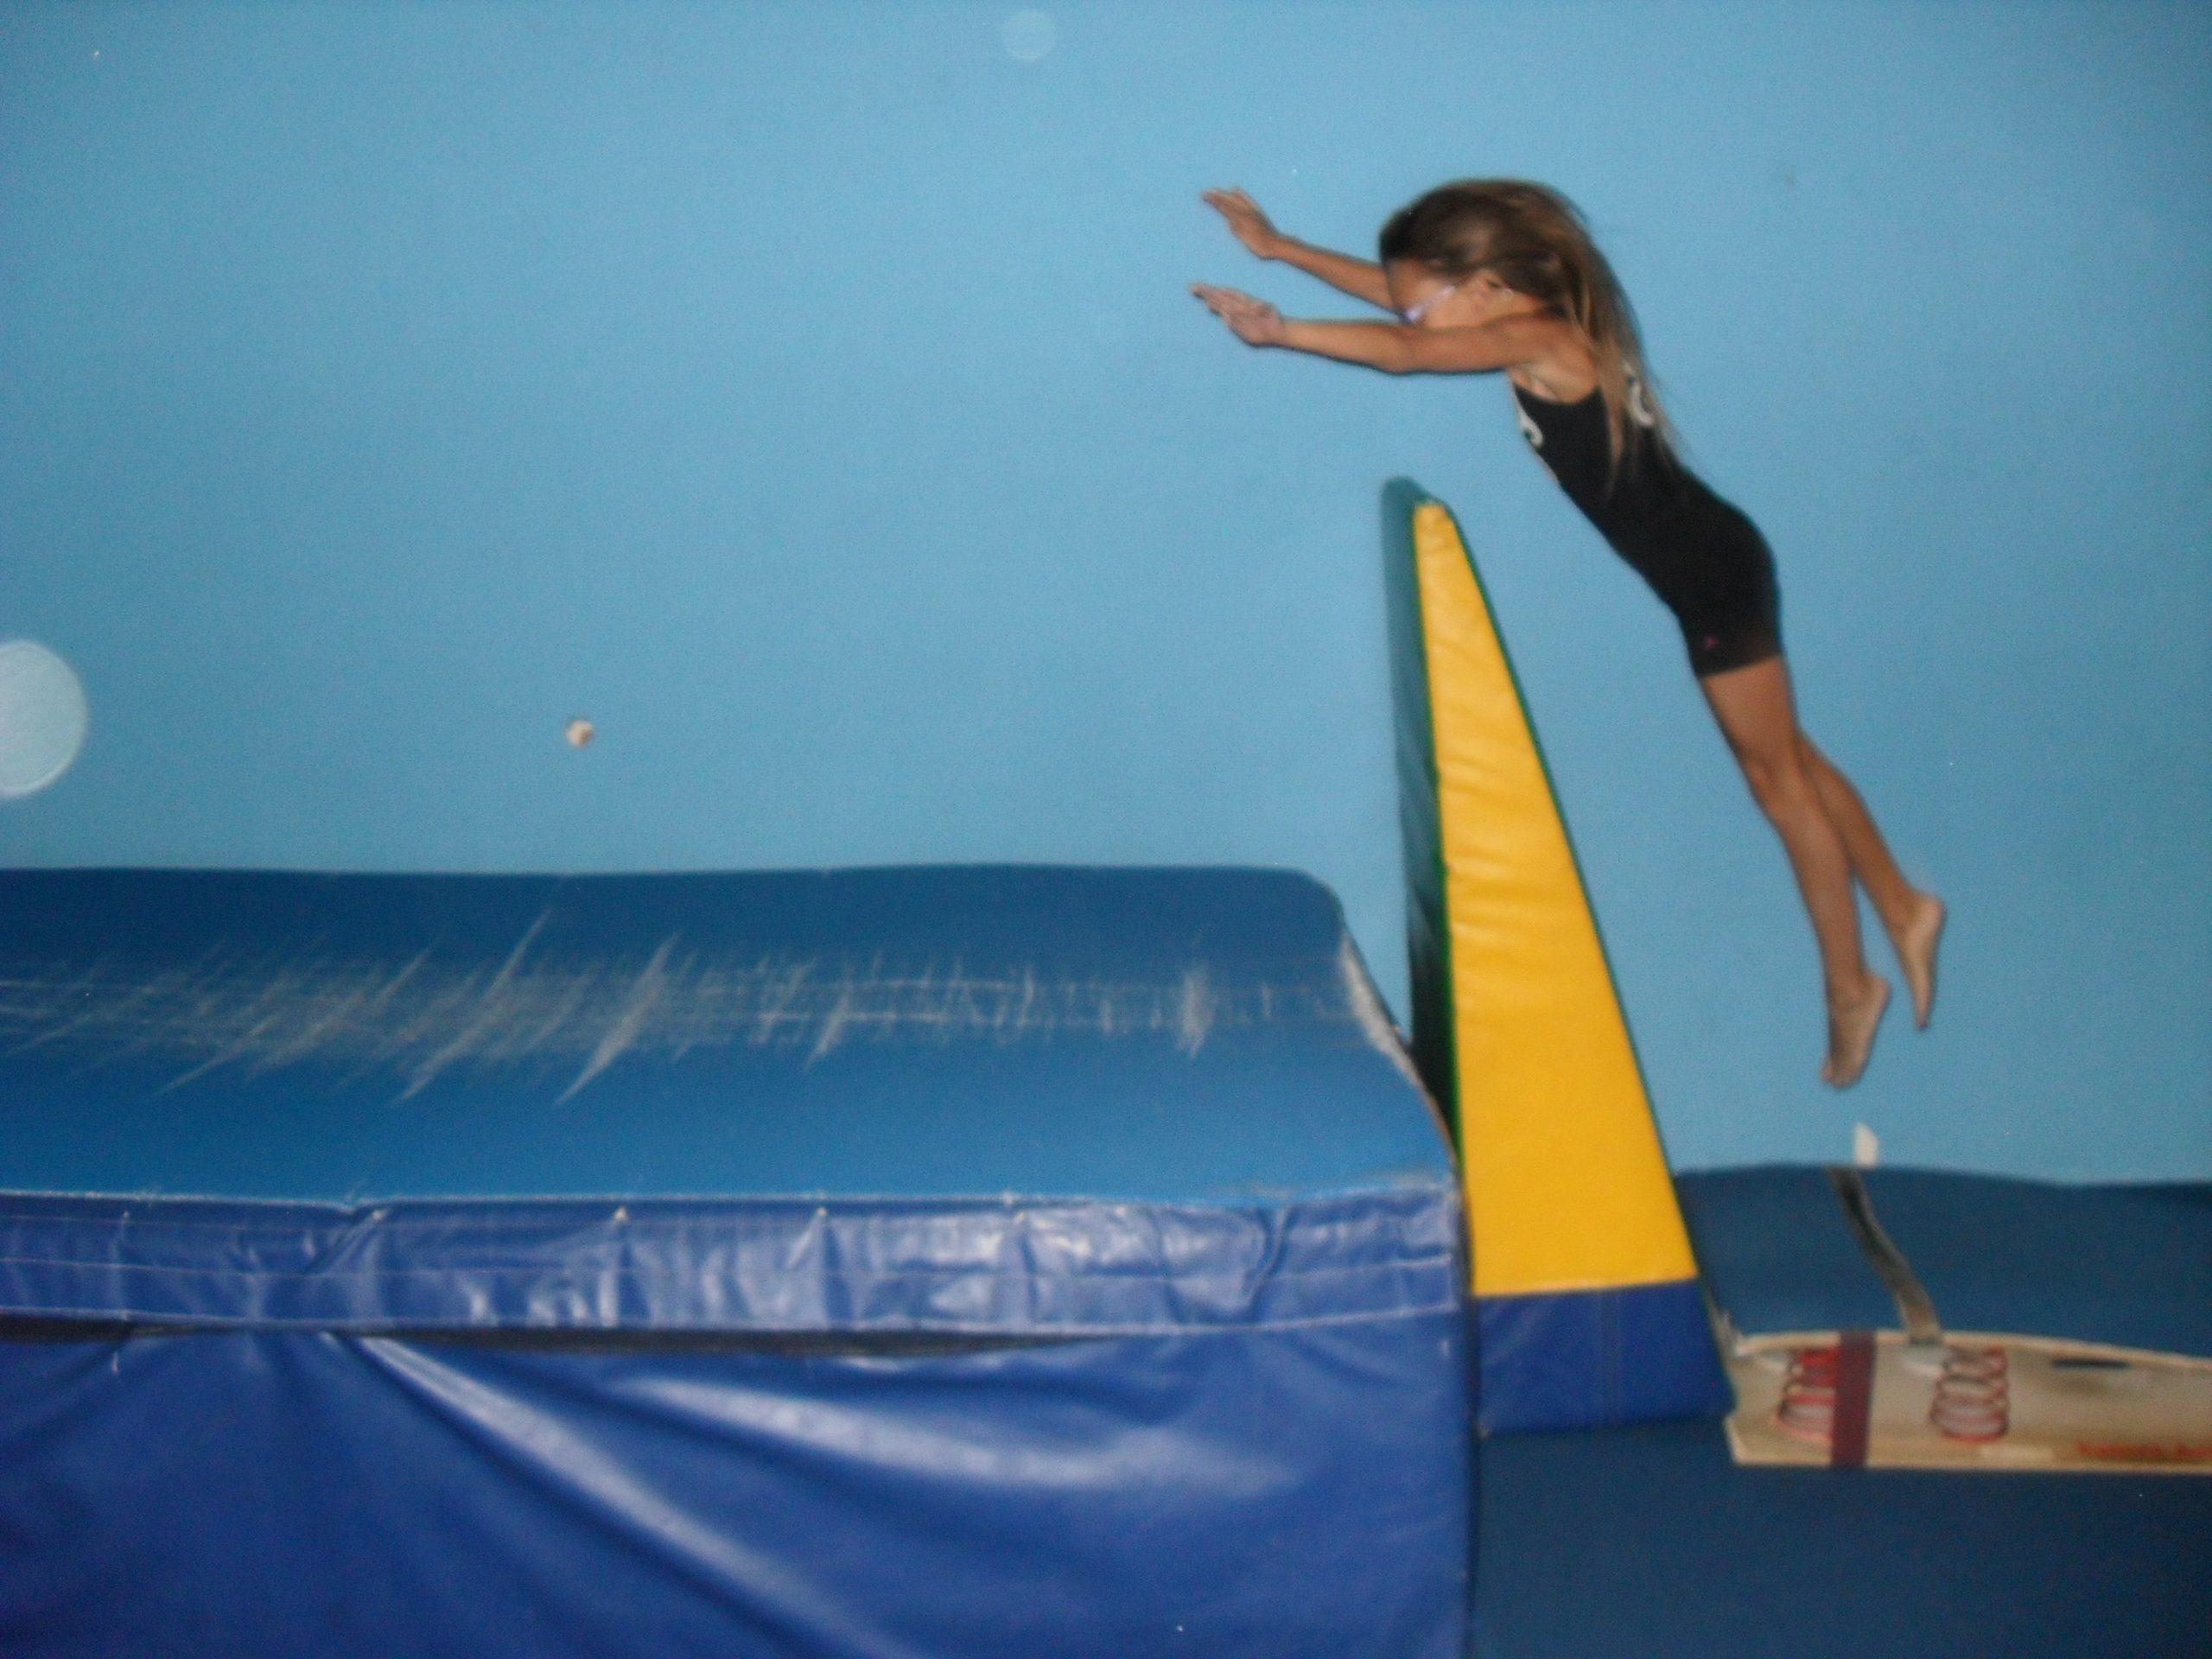 Girl Jumping over a wedge mat